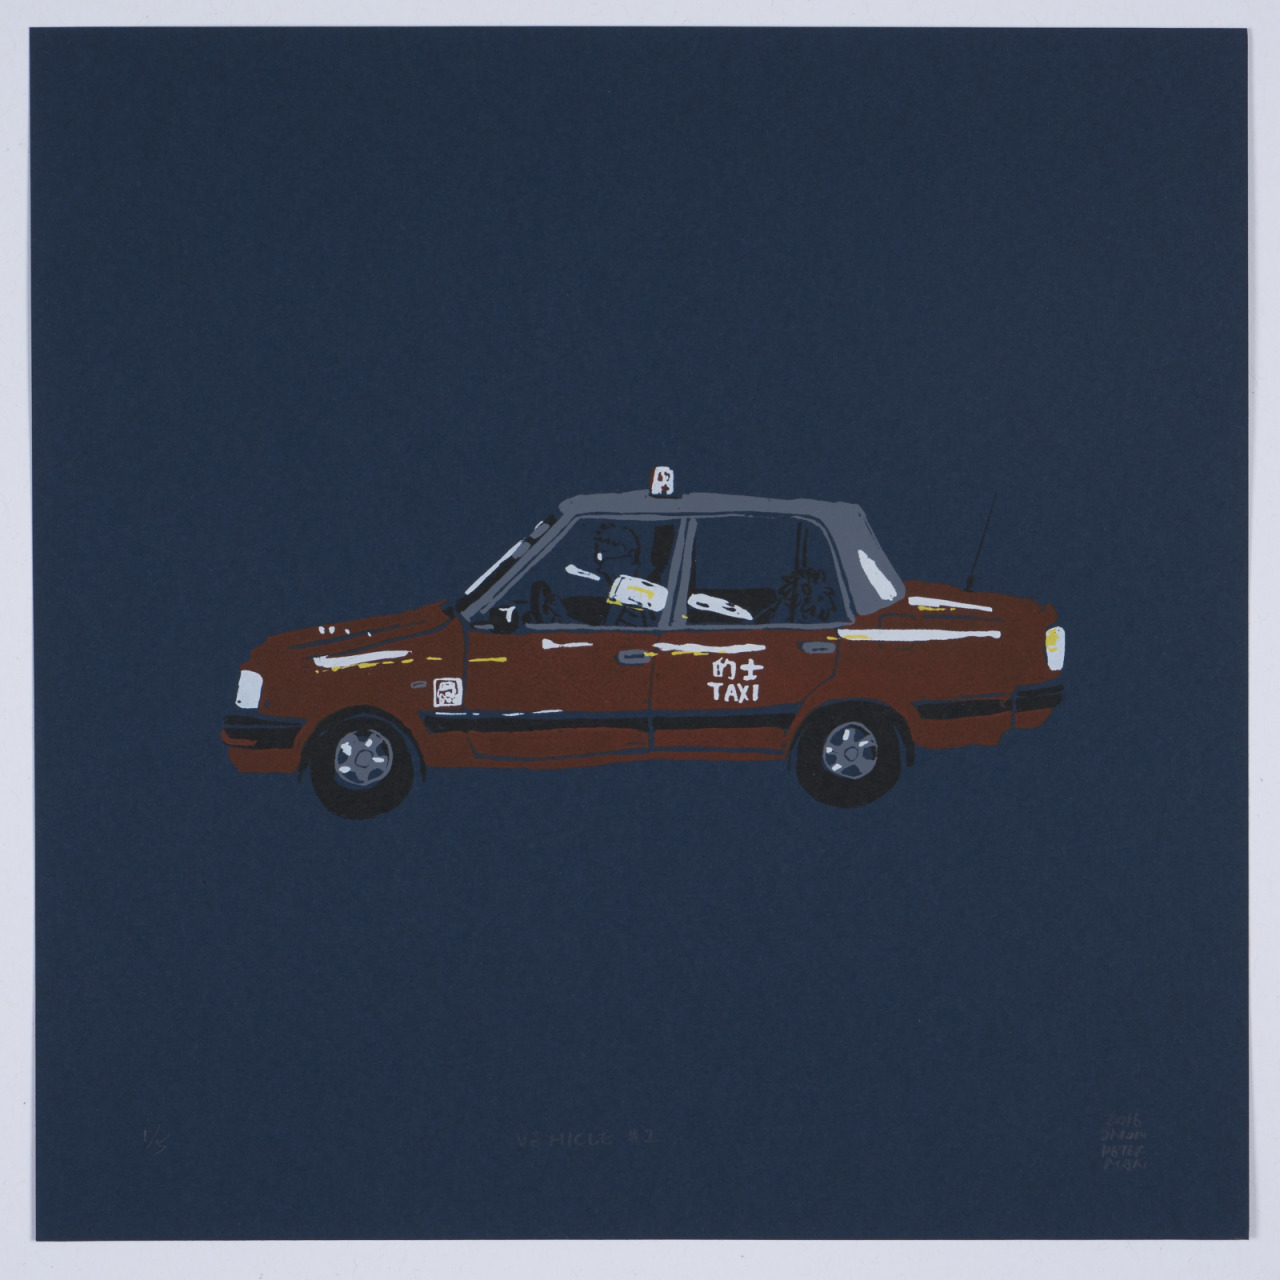 Vehicle #2